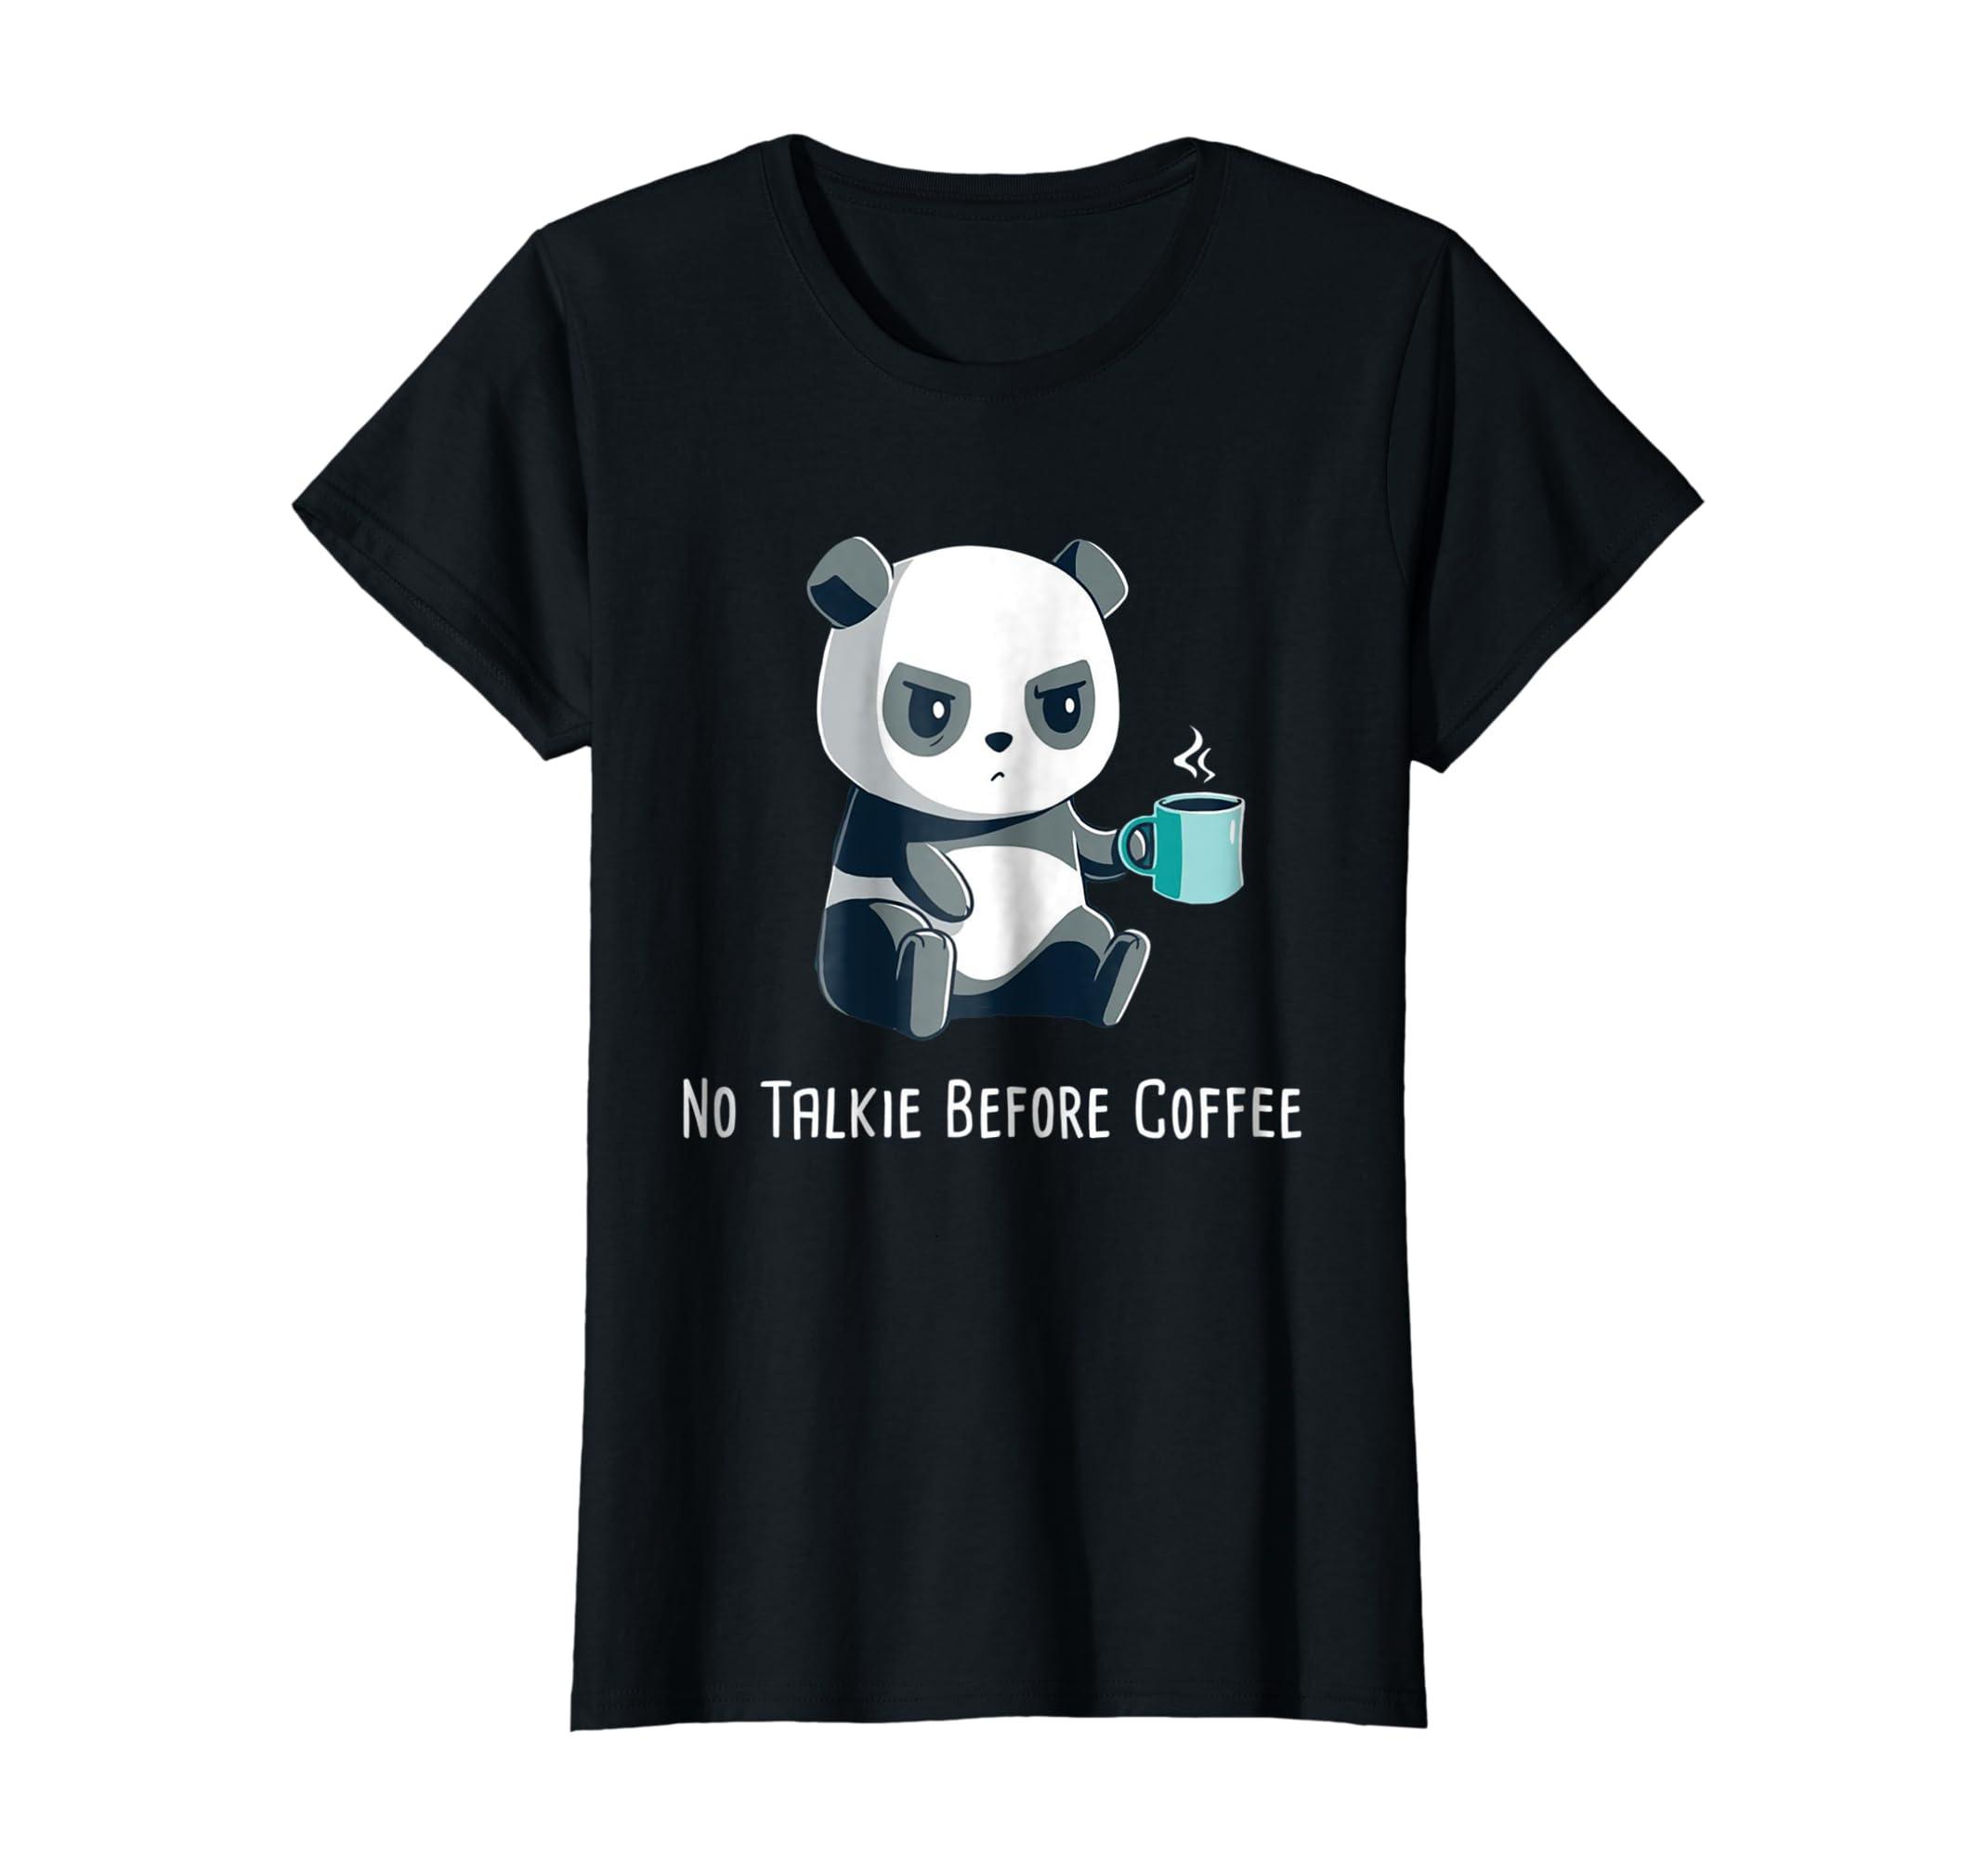 Cool Shirt